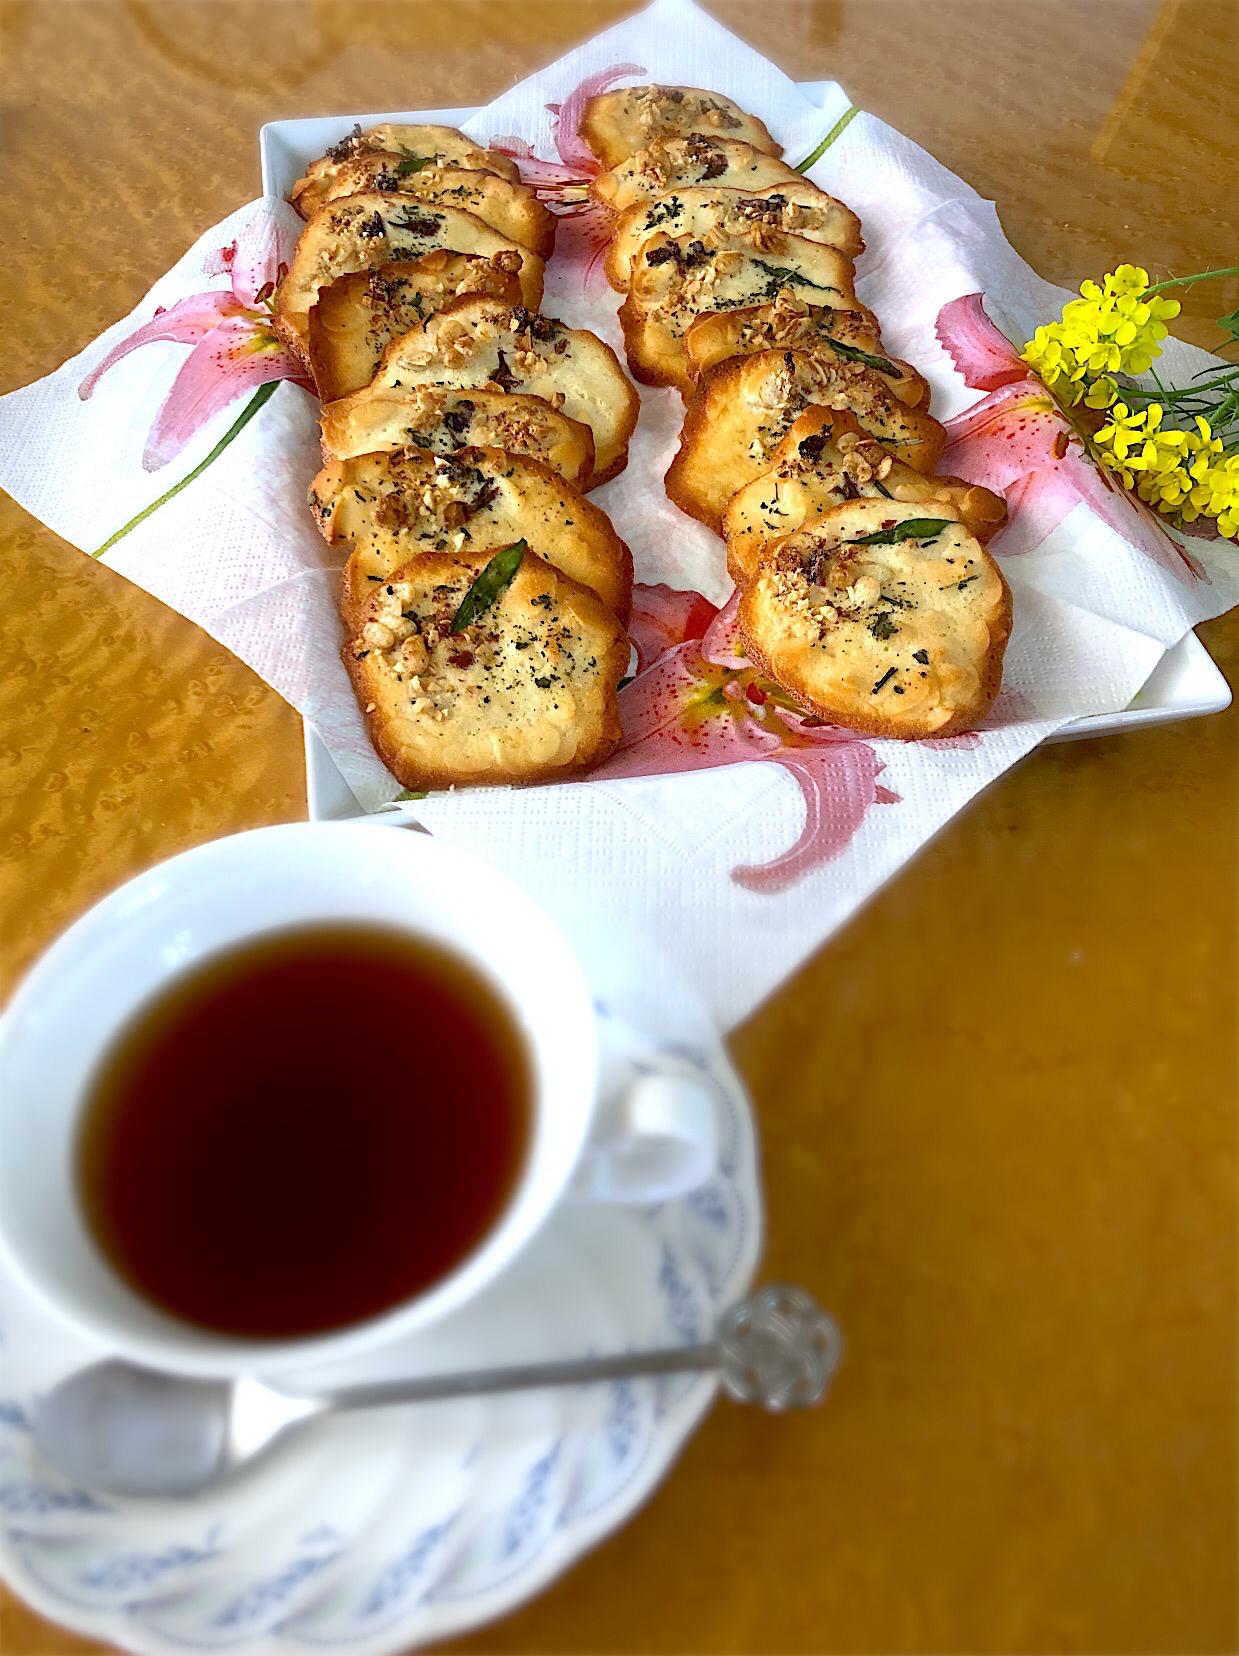 YouTubeより卵白消費に!アーモンドチュイル 山椒 桜 すみれ お茶を散らして春味!